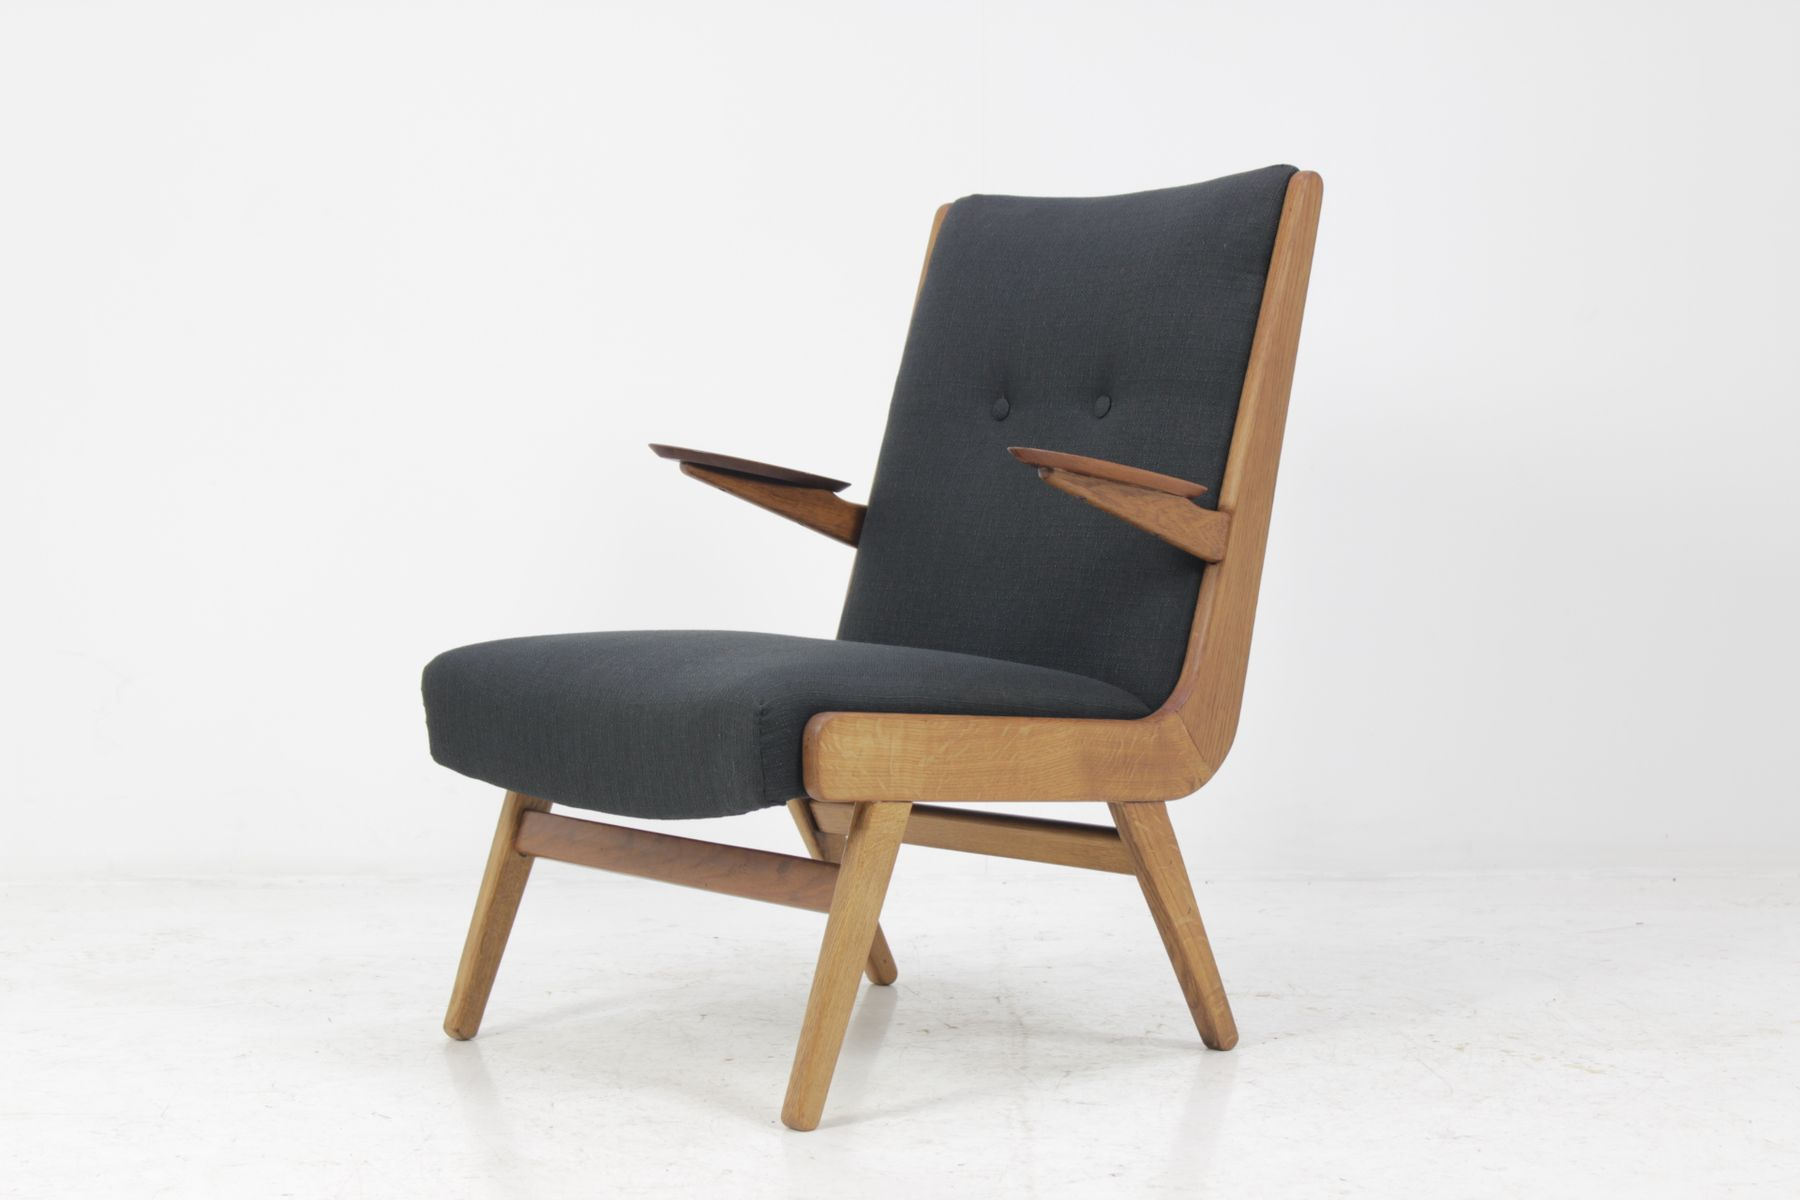 d nischer teak sessel 1960er bei pamono kaufen. Black Bedroom Furniture Sets. Home Design Ideas